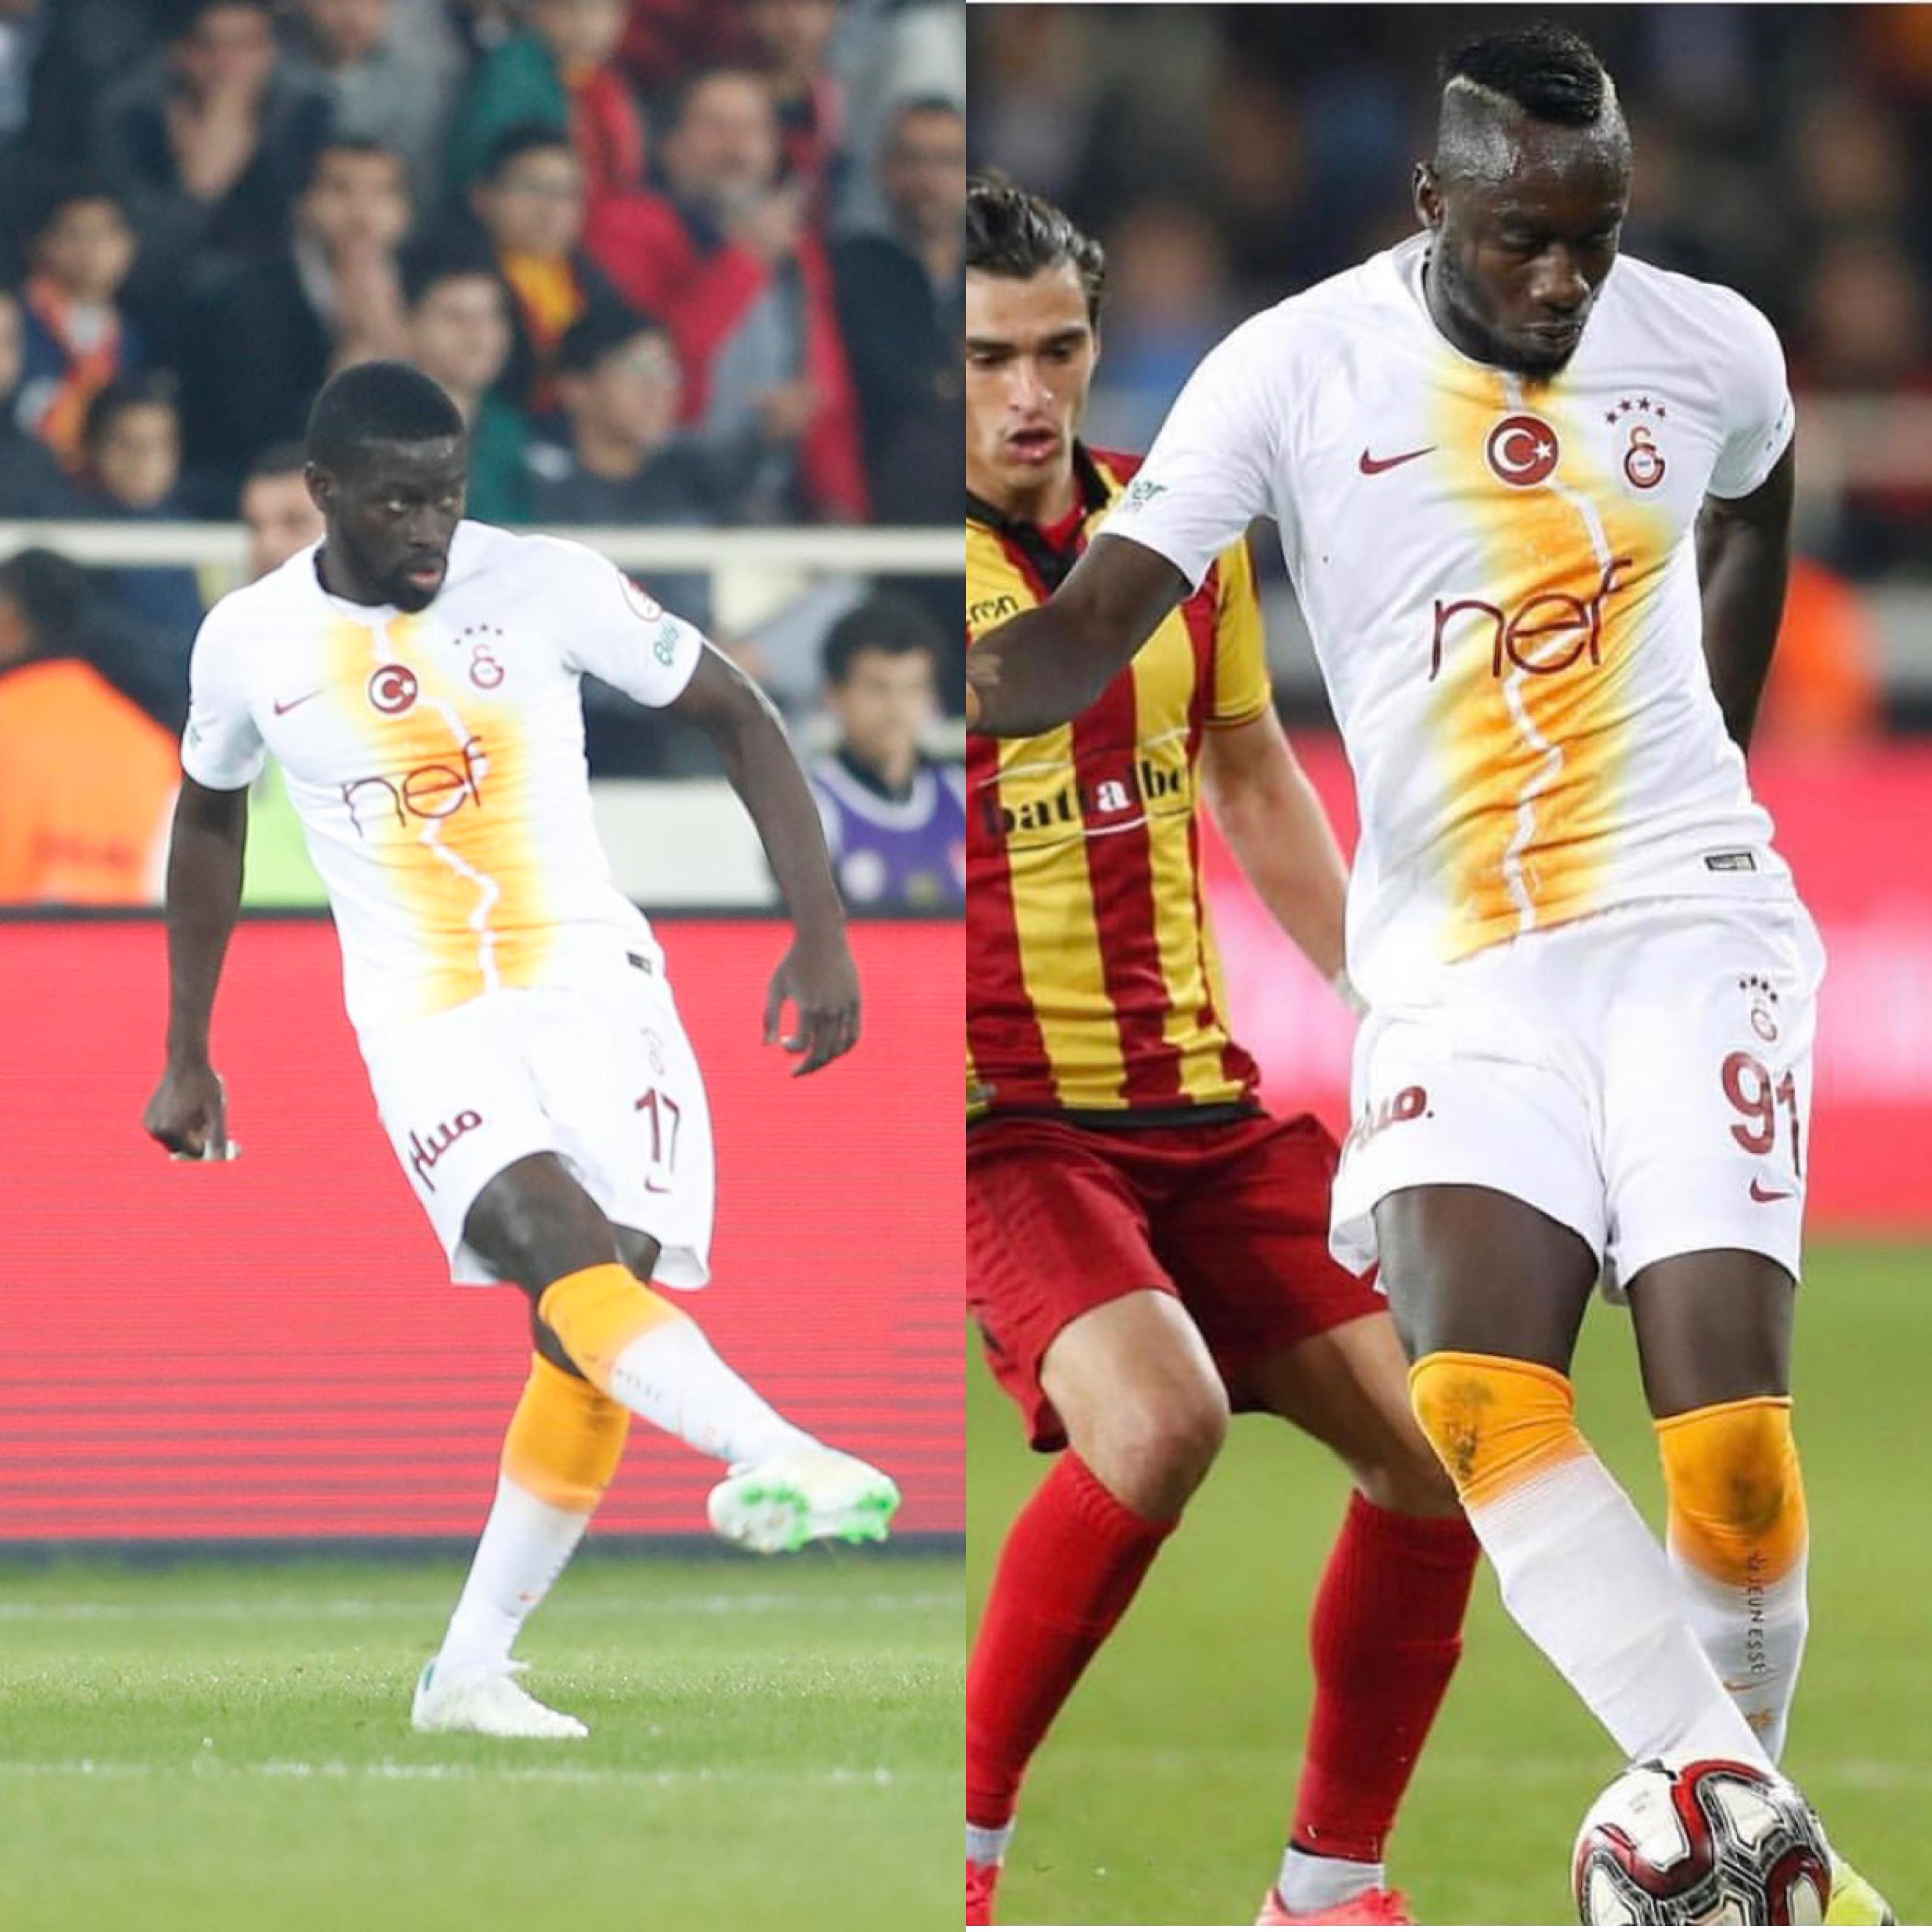 Coupe de Turquie : Pape Alioune Ndiaye et Mbaye Diagne portent Galatasaray en Finale.